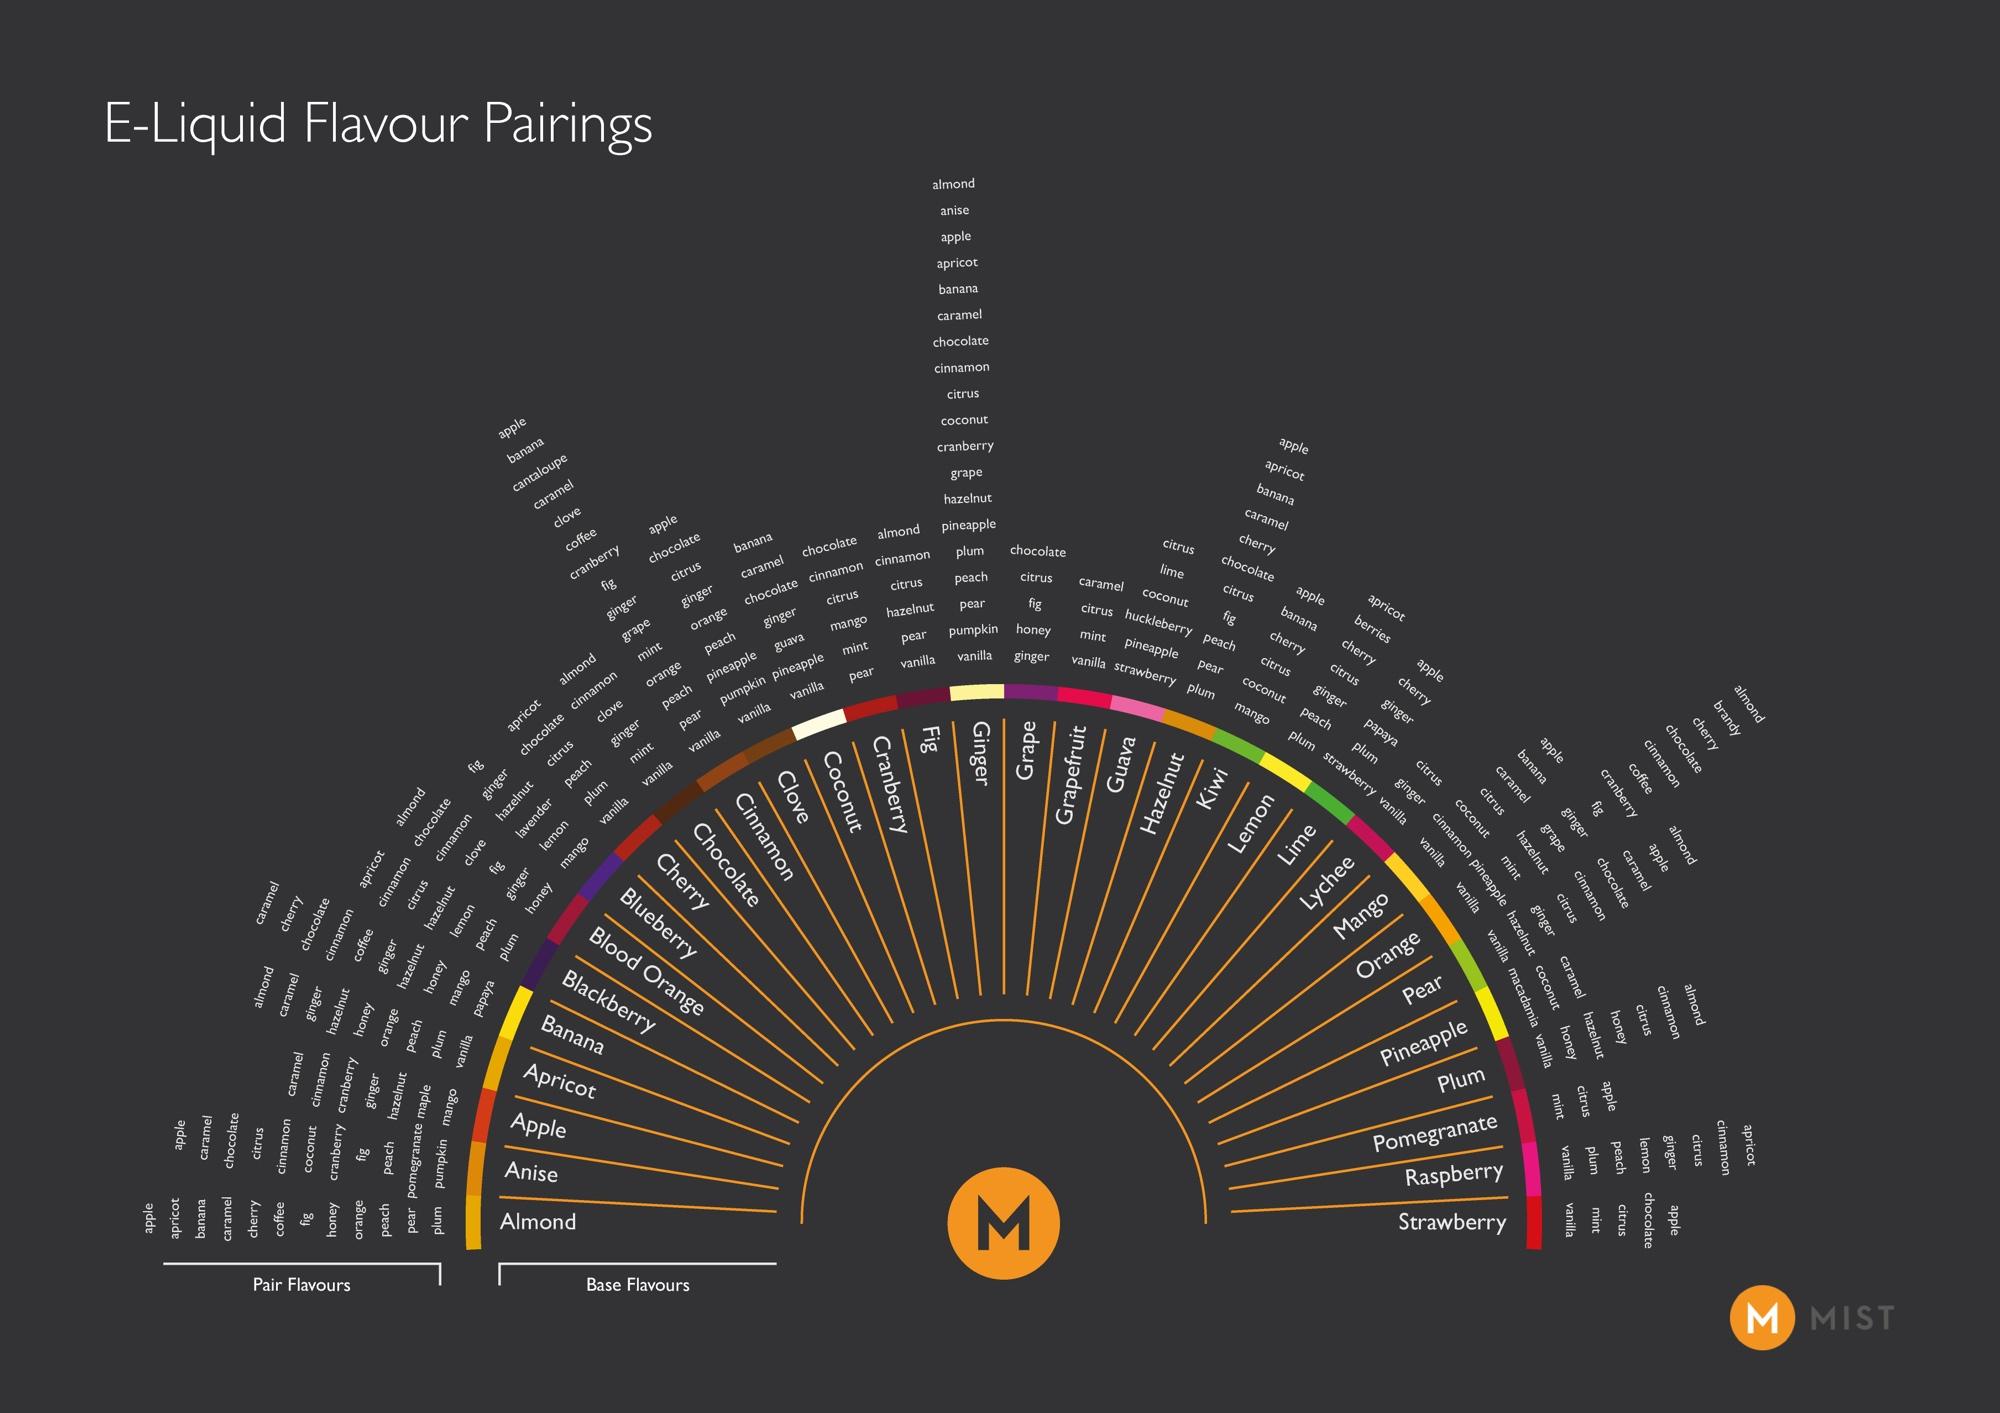 Flavor Pairing Charts for DIY E-Juice - VapePassion com